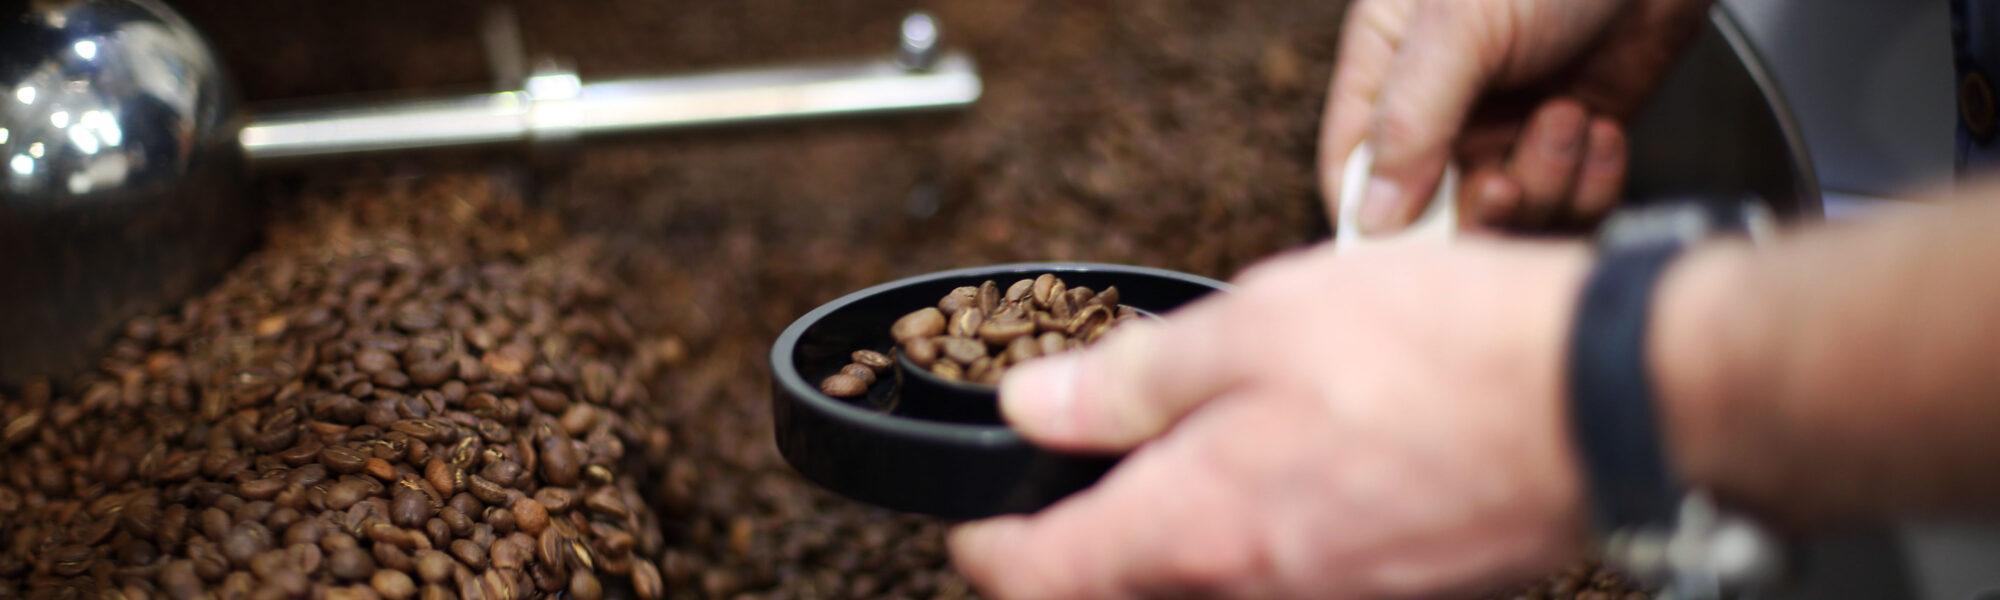 Hands on Coffee Roasting